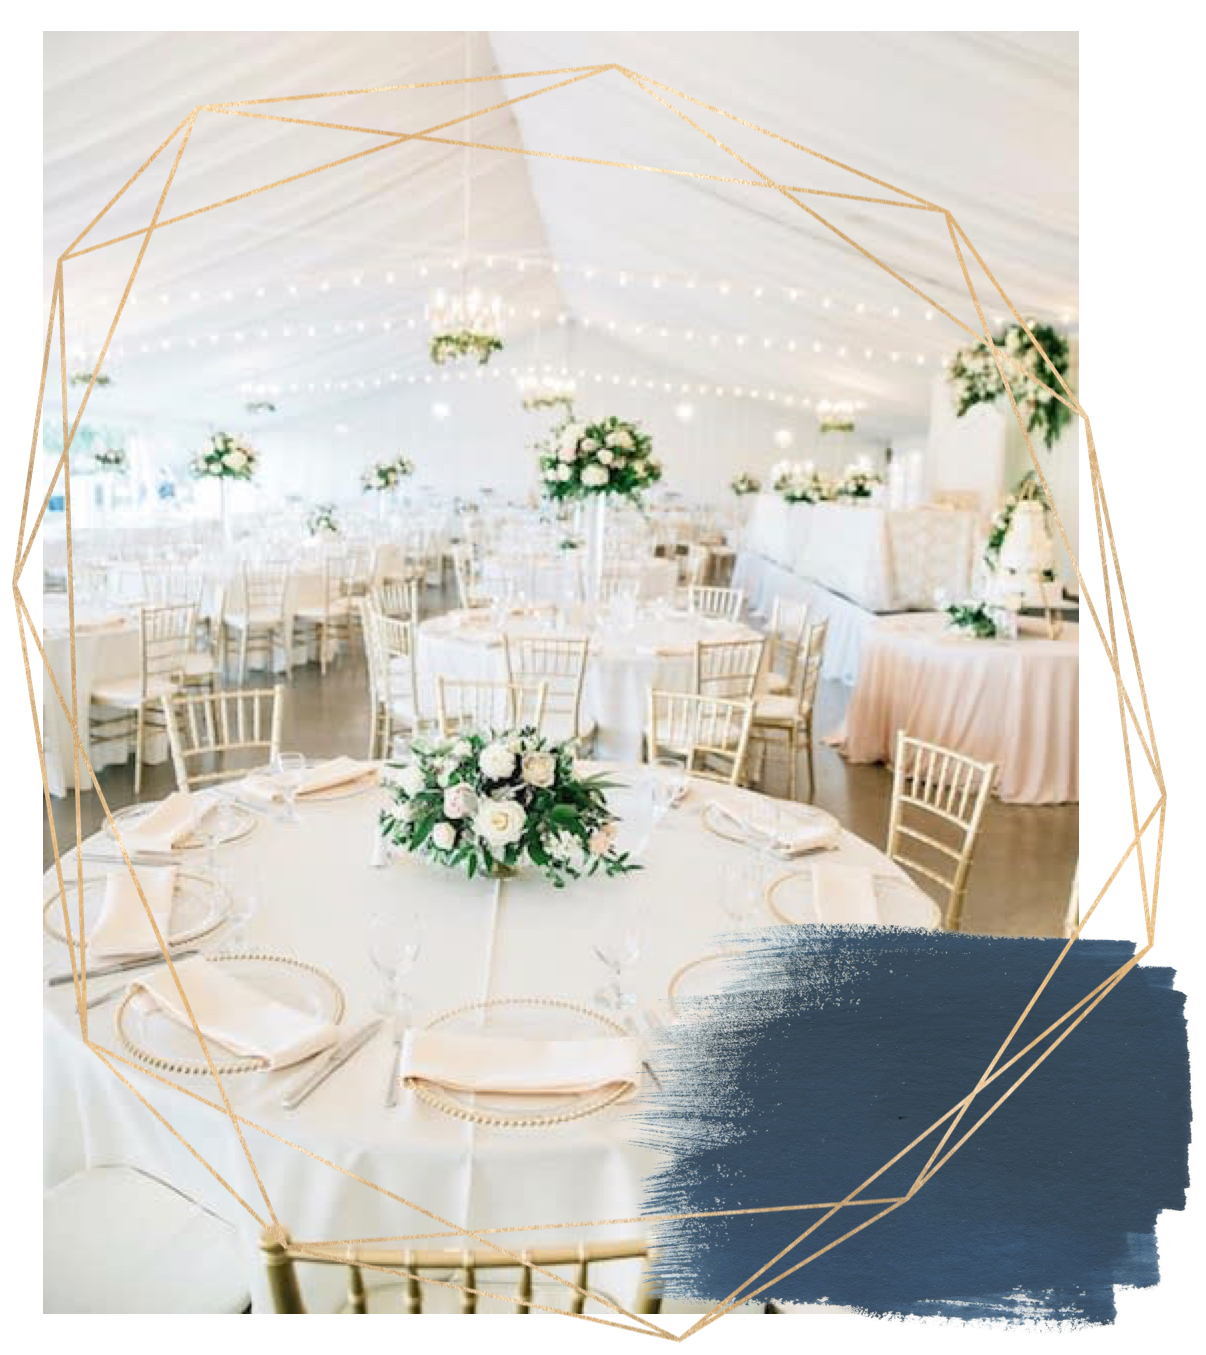 SacDecorNrentals-wedding-sacramento-event-rentals-10.jpg